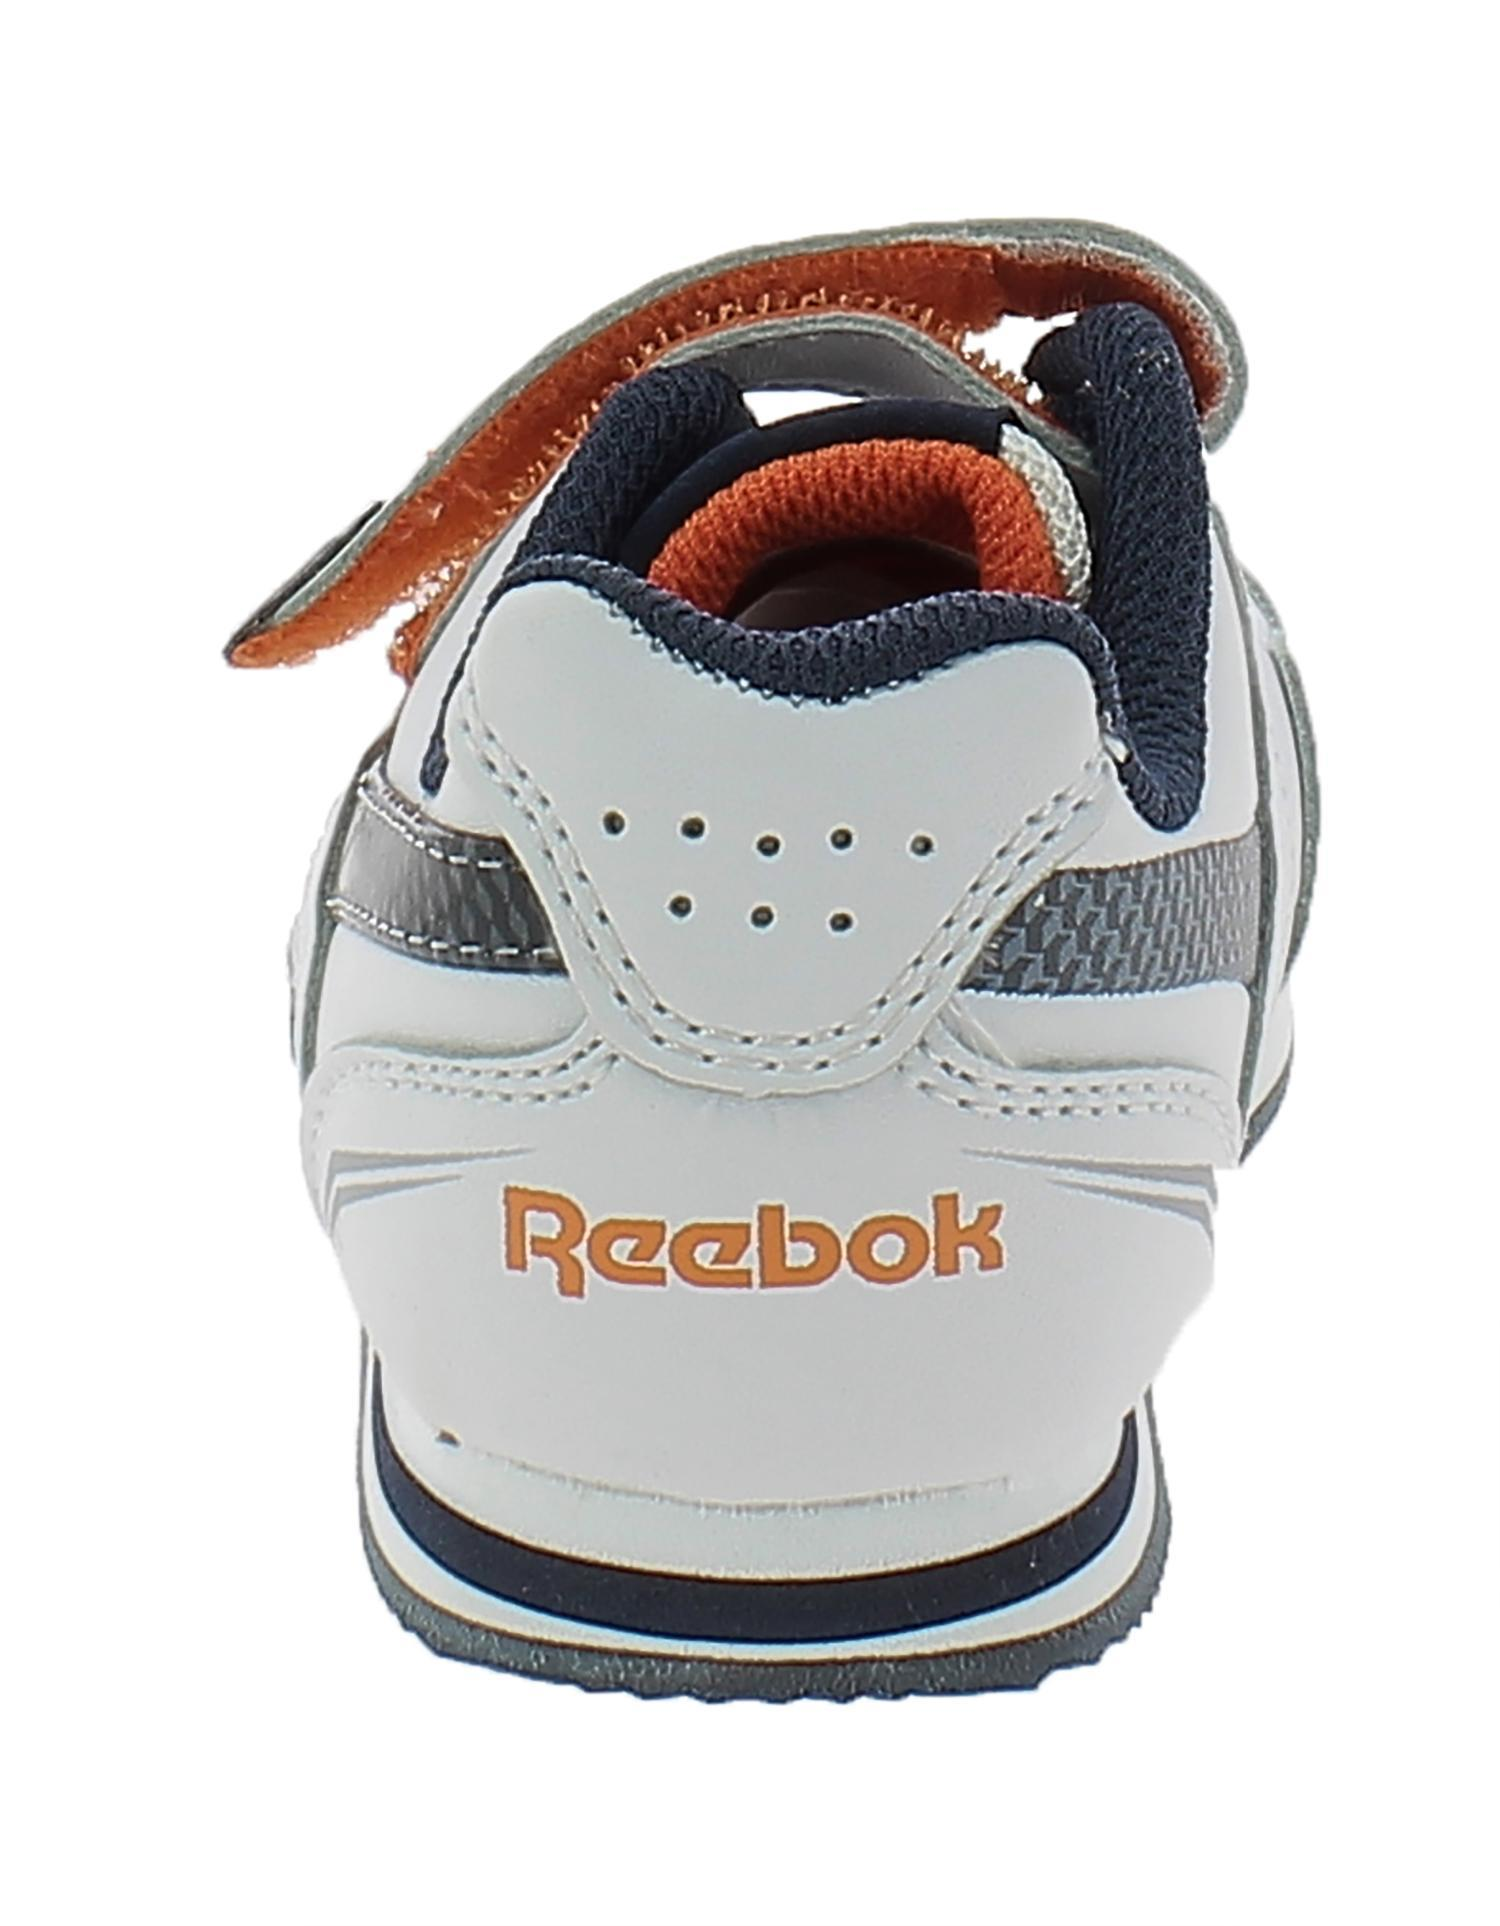 reebok reebok globeam scarpe bambino bianche blu lucette 52361